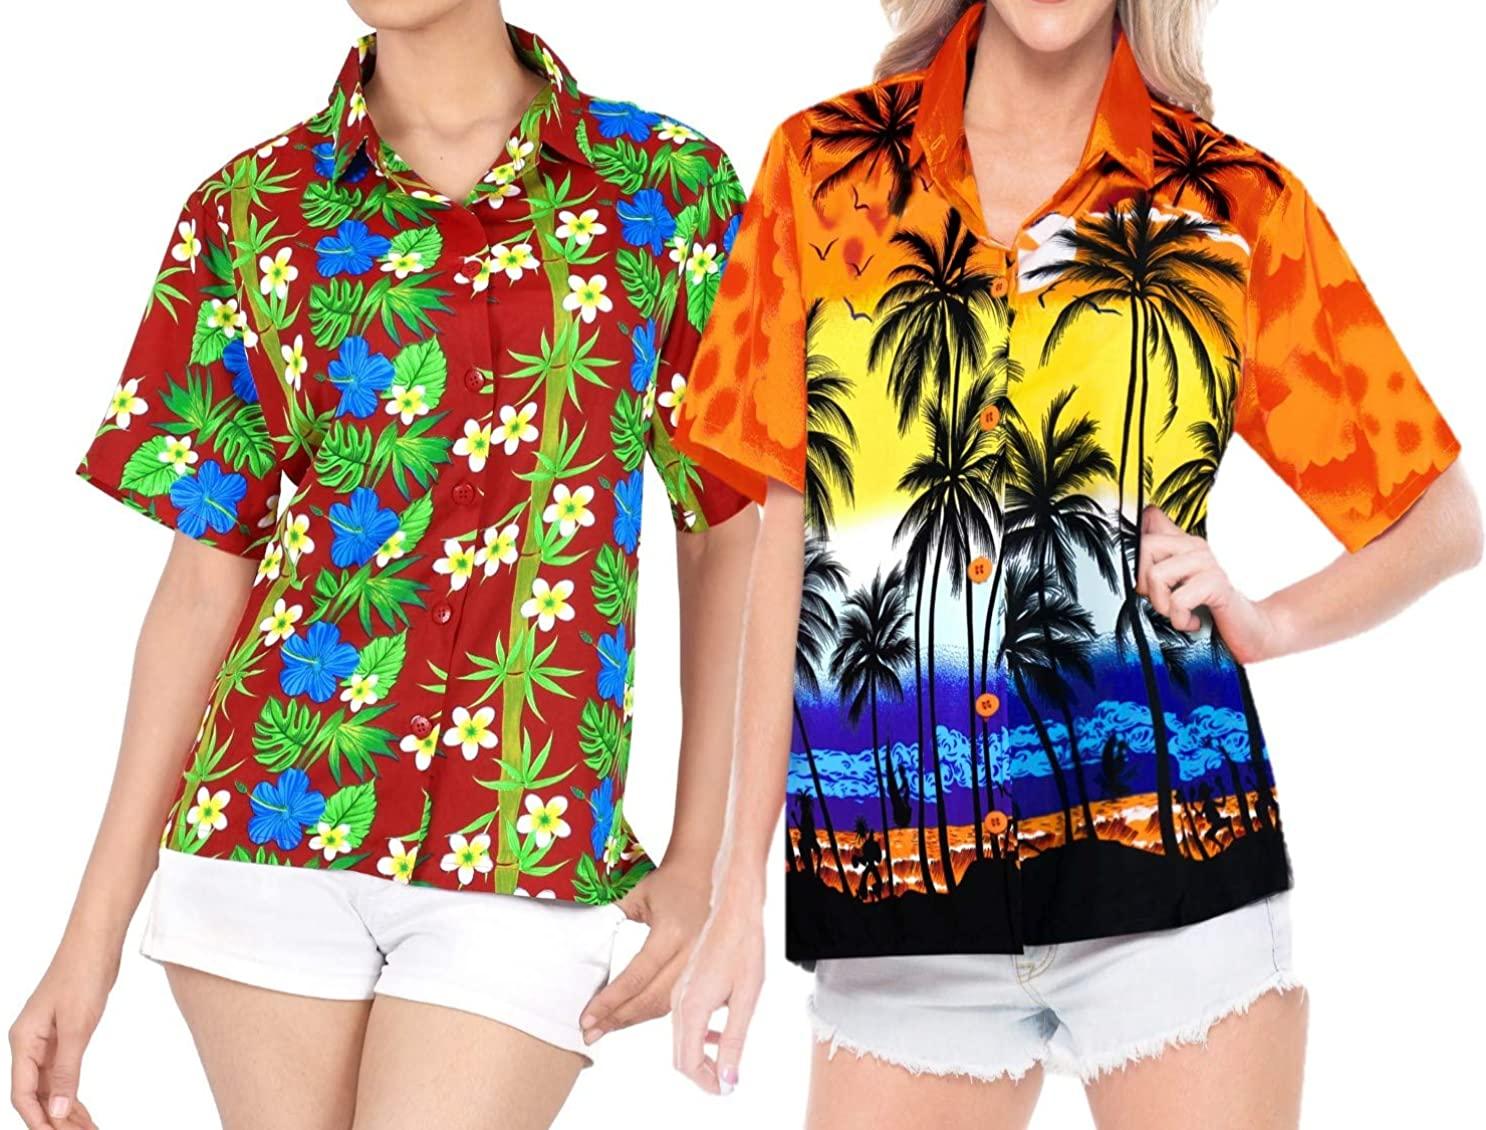 LA LEELA Women's Plus Size Funny Hawaiian Shirt Beach Button Down Up Work from Home Clothes Women Beach Shirt Blouse Shirt Combo Pack of 2 Size XXL